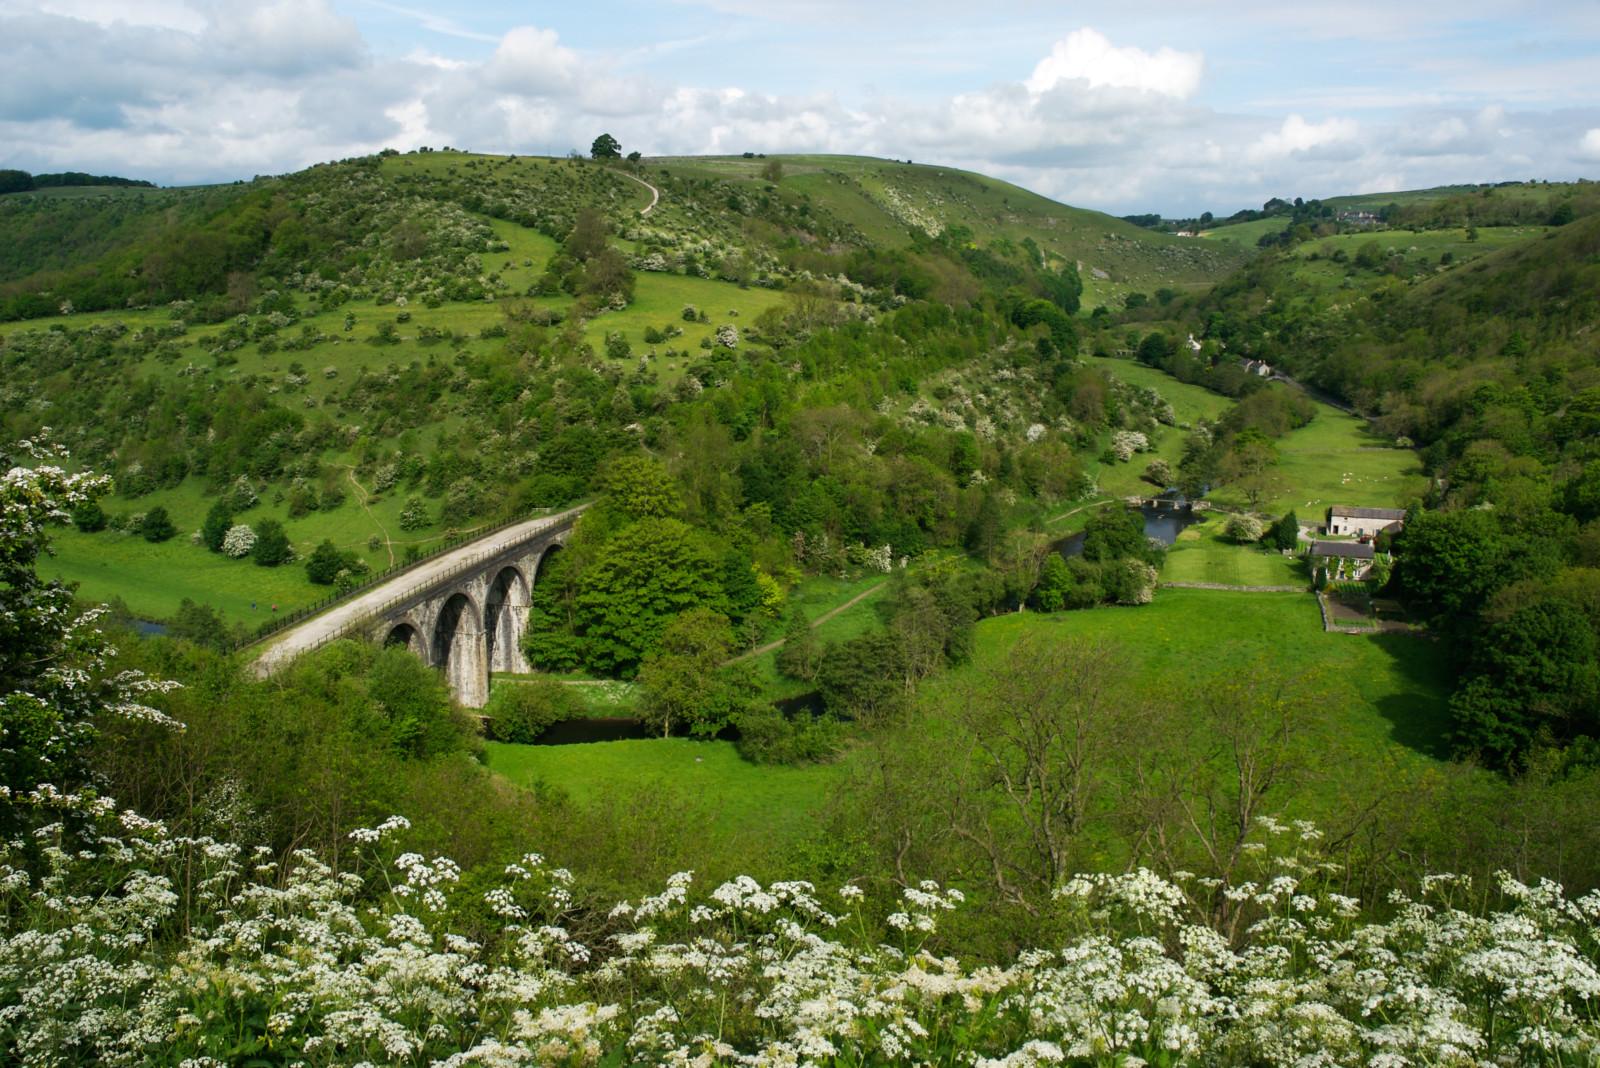 Monsal Head viaduct on the Monsal Trail